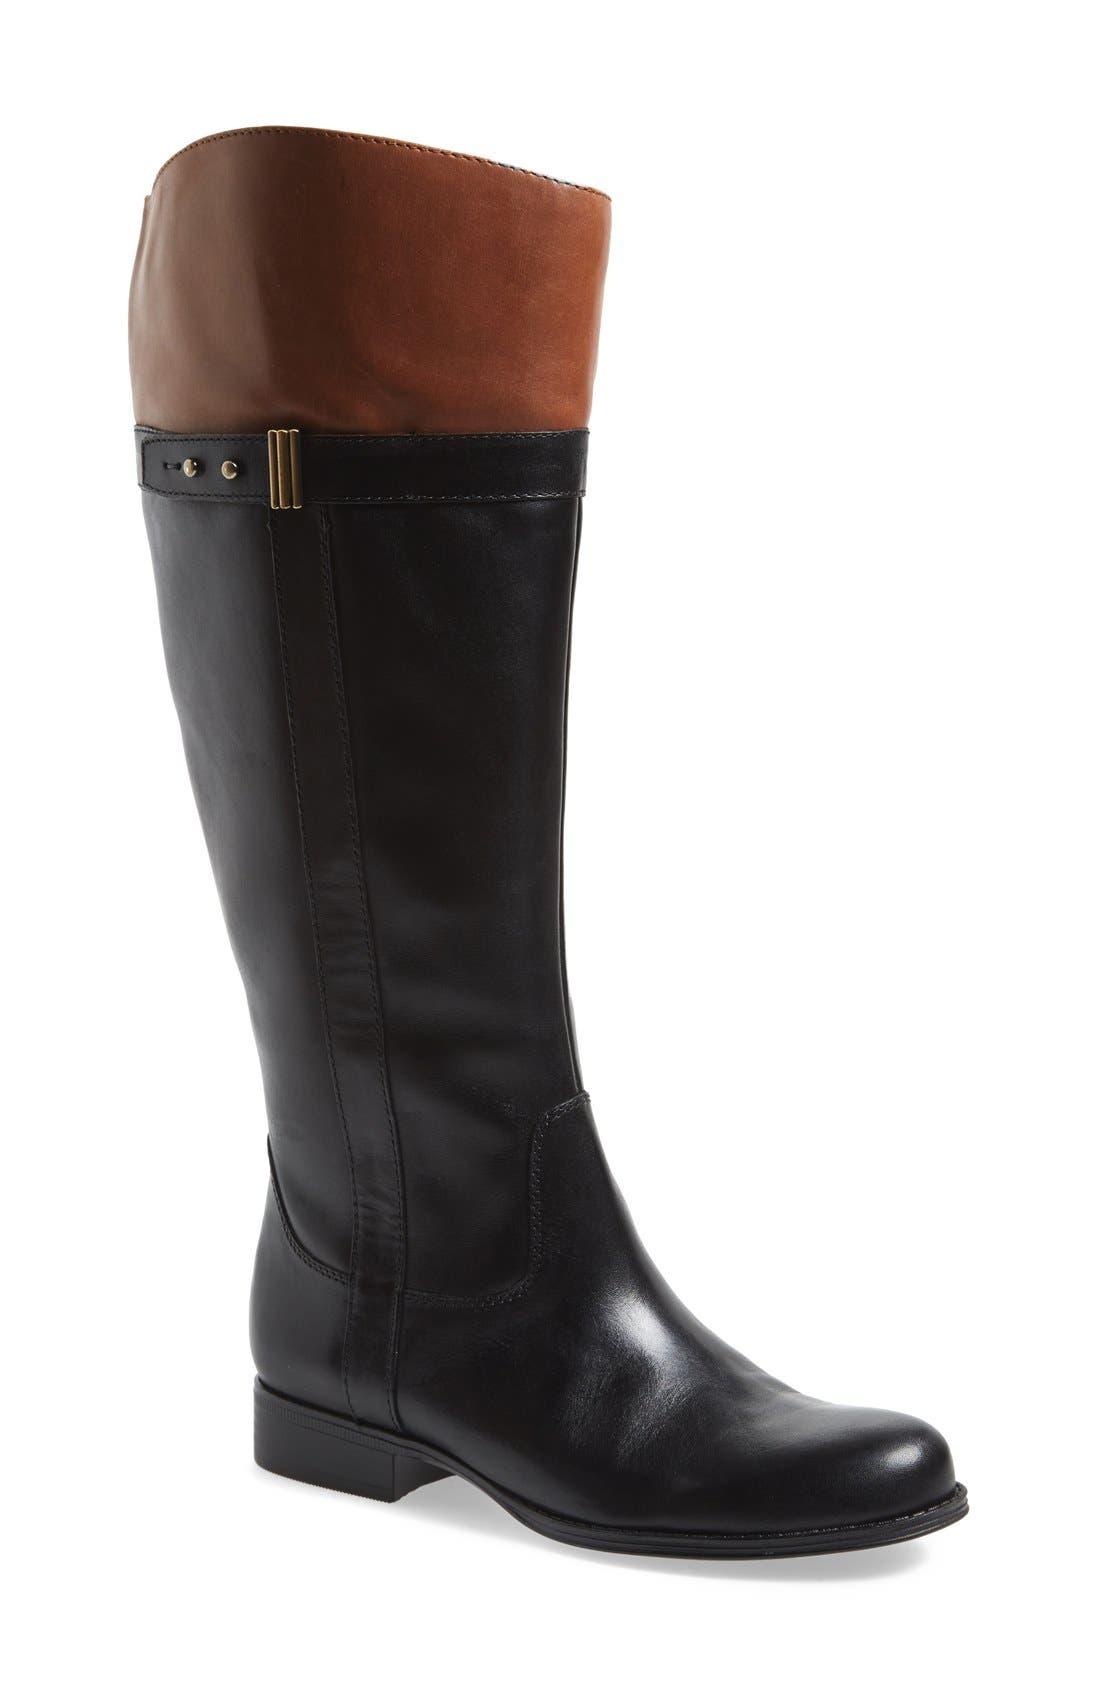 Alternate Image 1 Selected - Naturalizer 'Josette' Knee High Boot (Wide Calf) (Women)